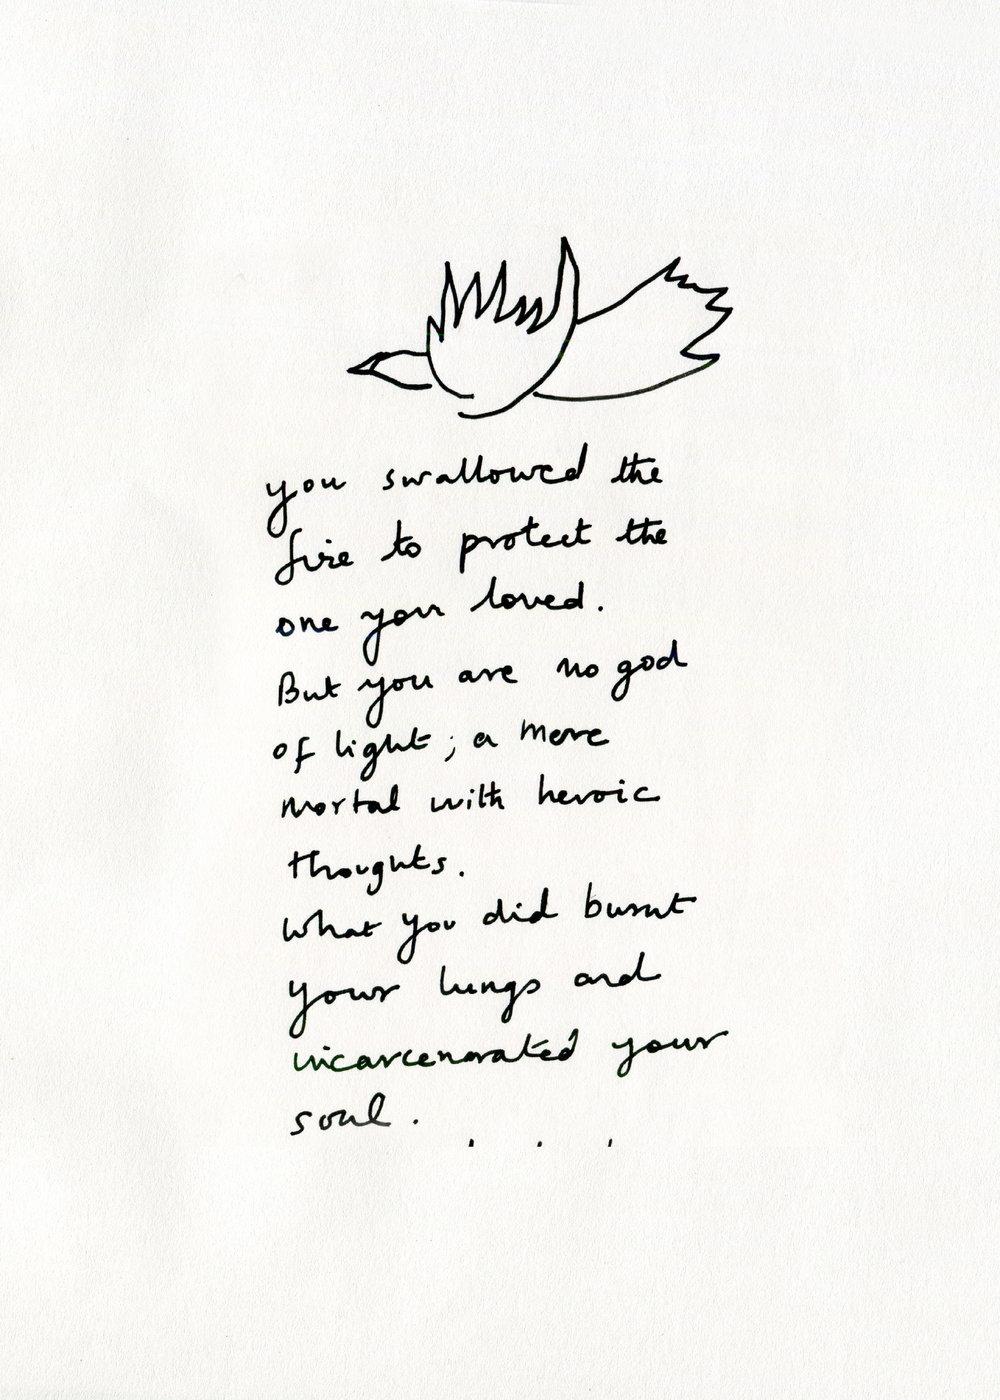 lullaby_13.JPG